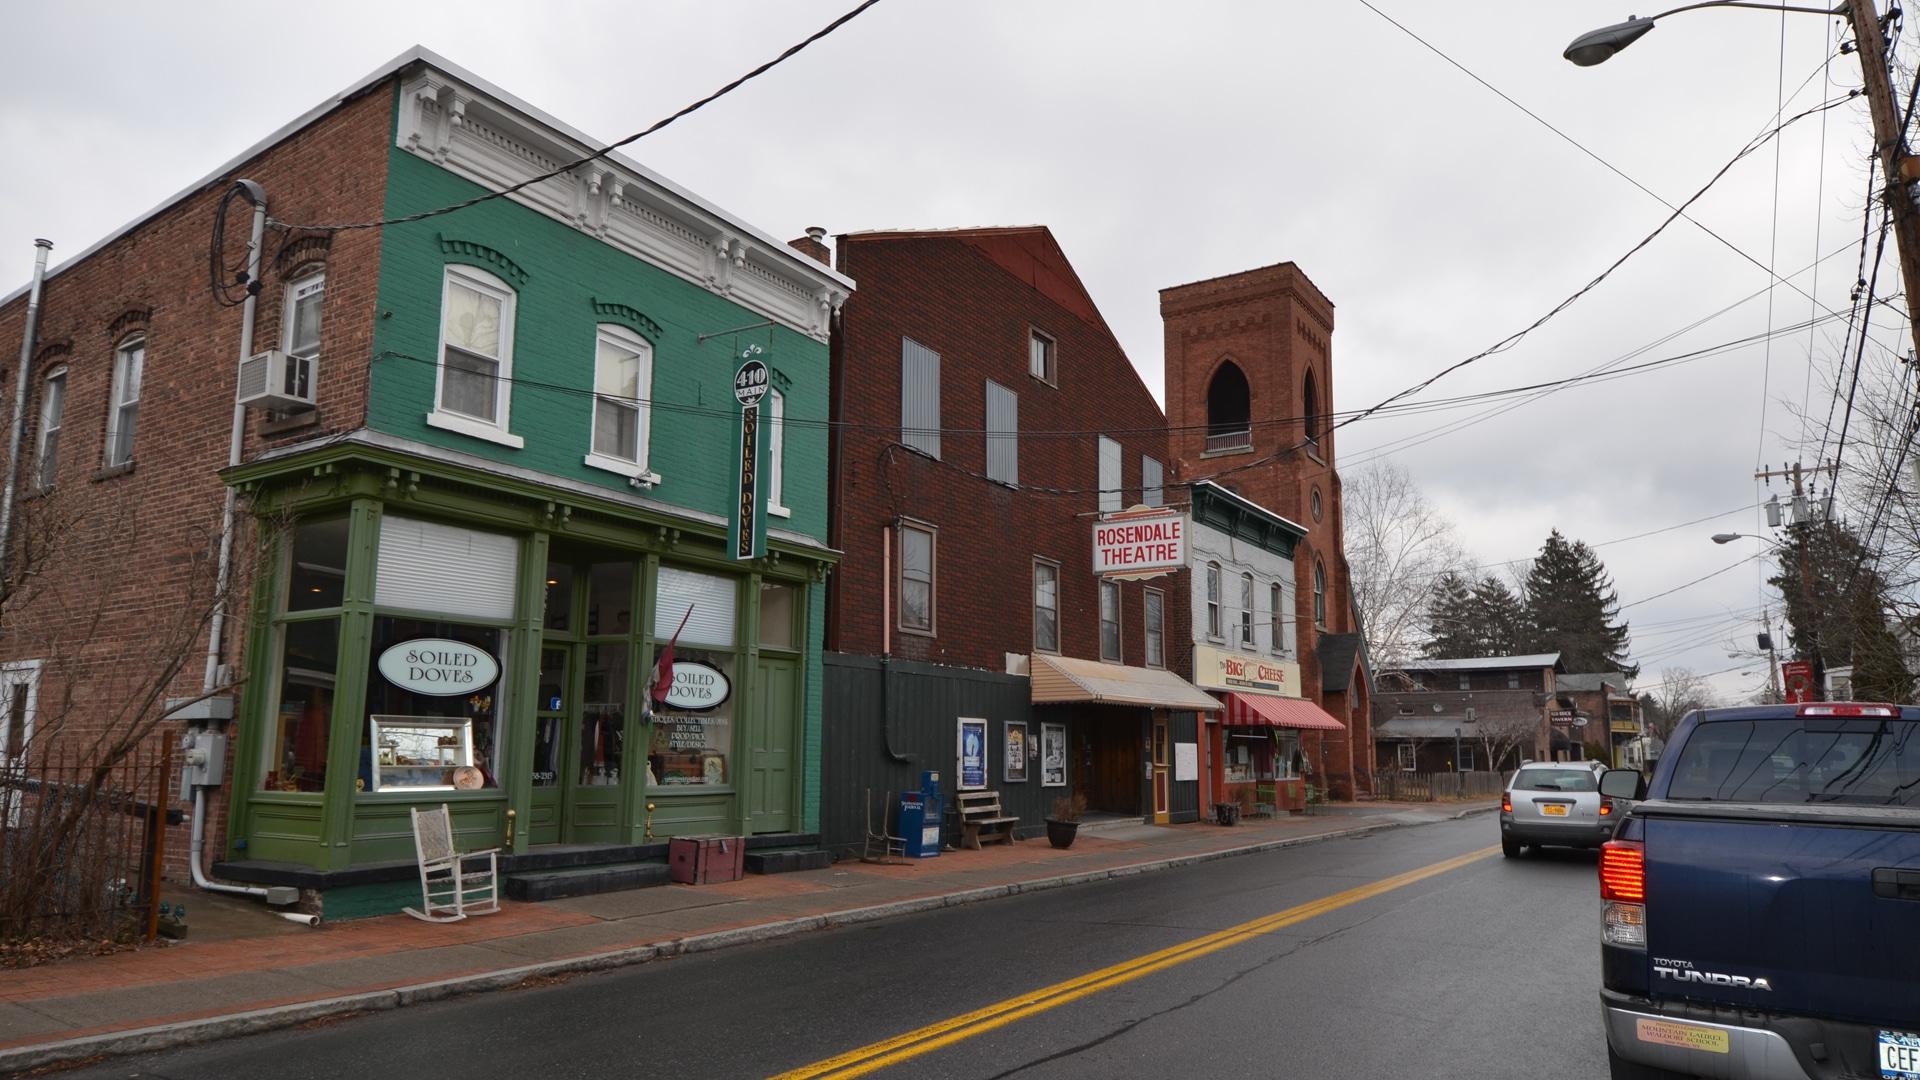 Rosendale Theatre Street View